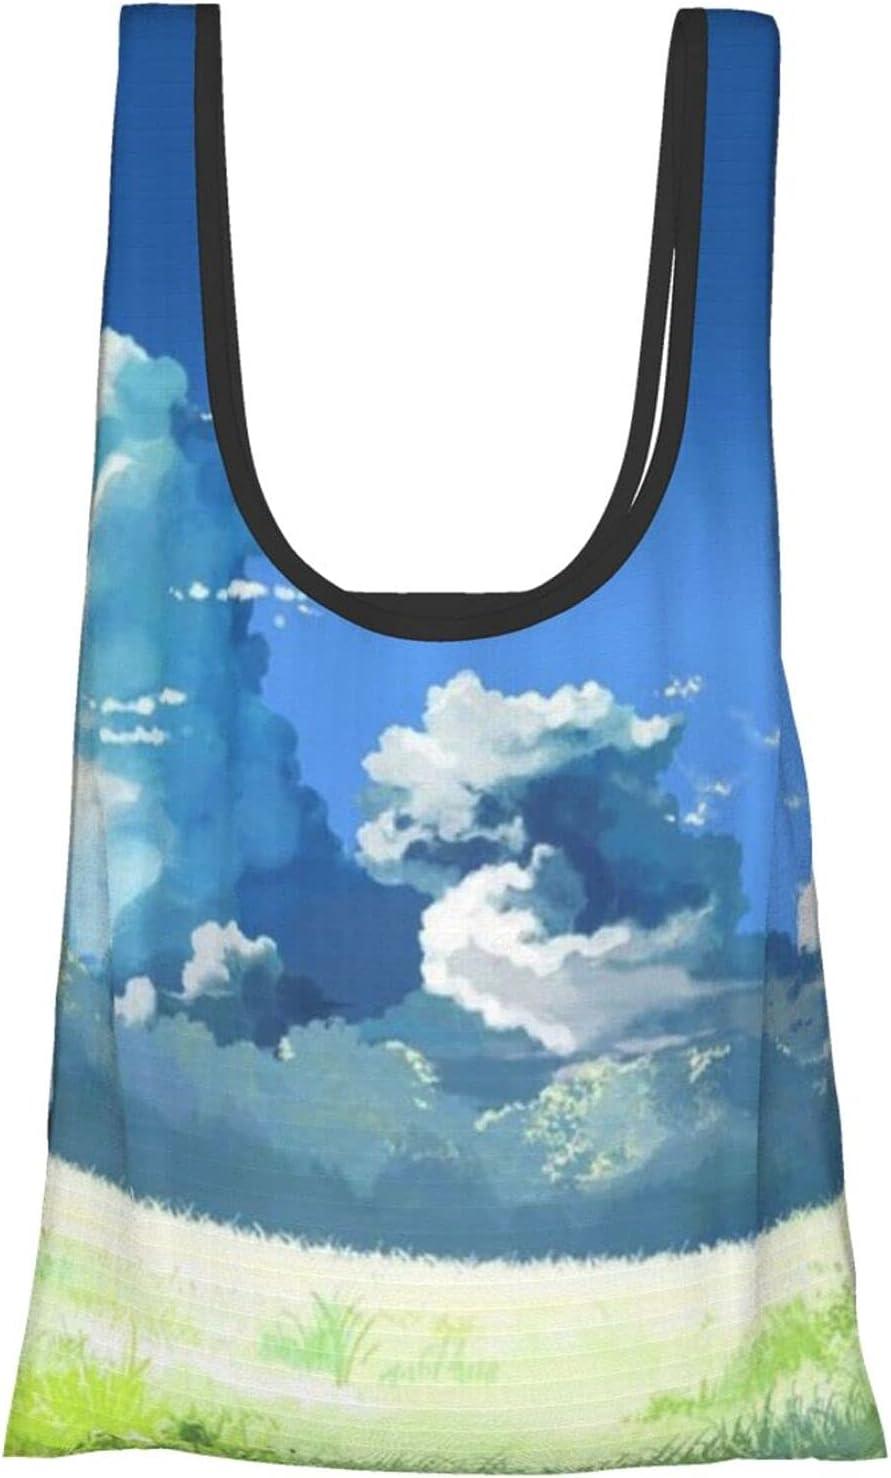 JIANGLAMGHI 검 ONLINEREUSABLE 잡화 가방 FOLDABLE ECO 친절한 핸드백 쇼핑 가방 안에 넣을 수 있는 주머니 빨 수 있는 ECO 친절한 쇼핑백을 보유할 수 있는 무거운 잡화